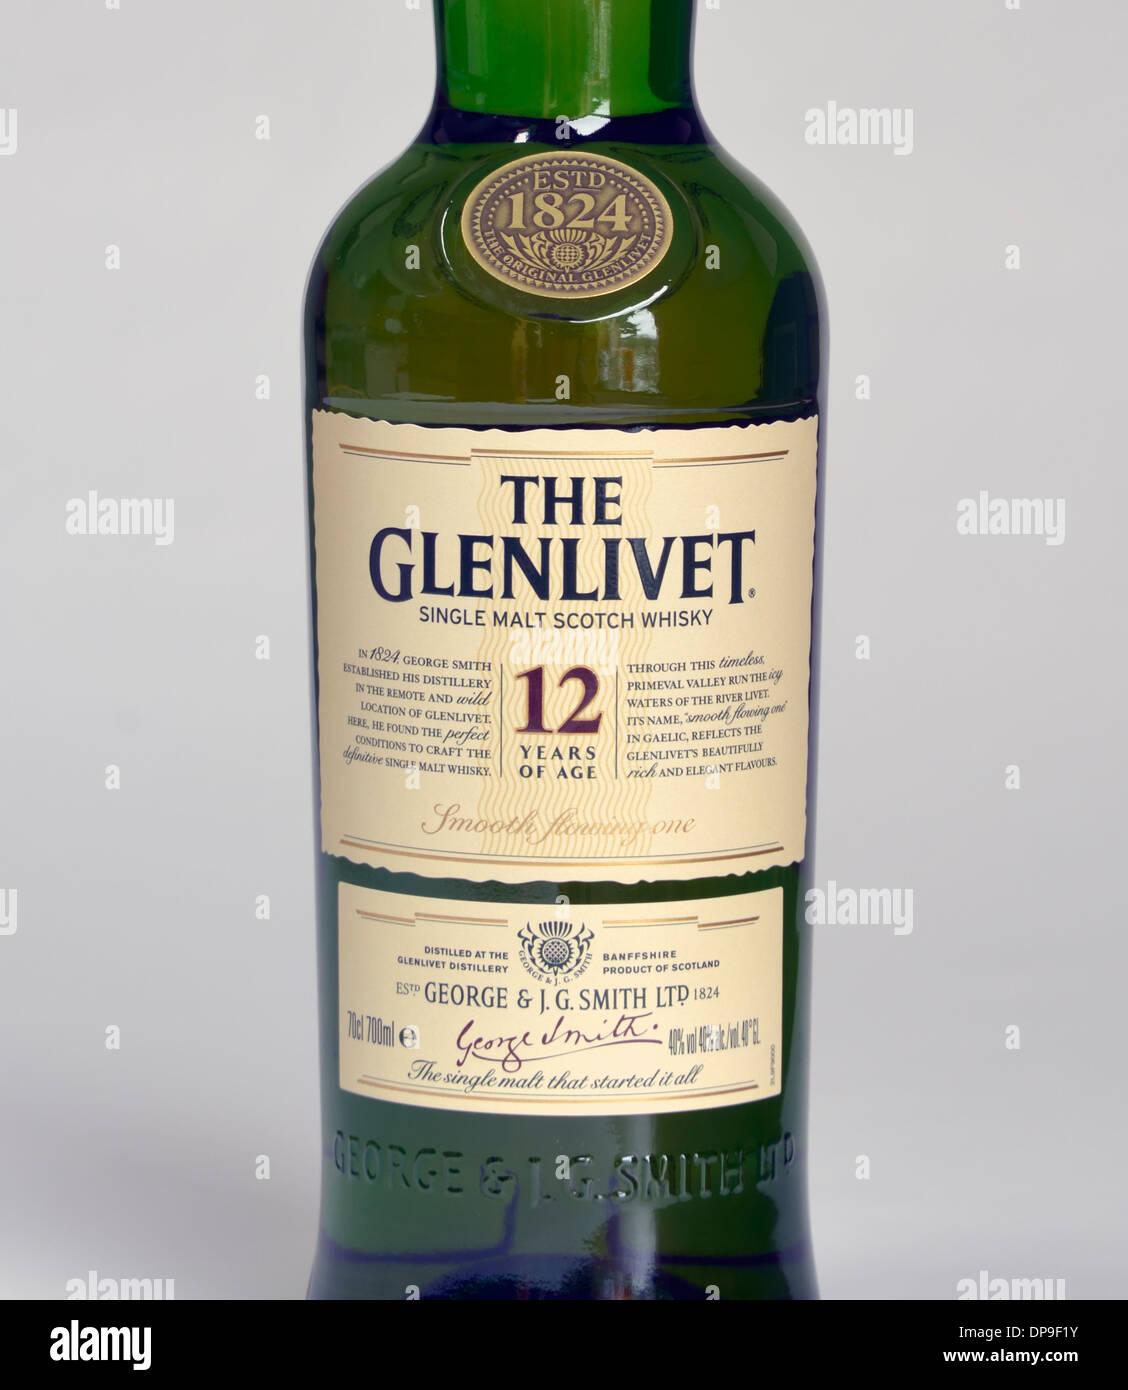 The Glenlivet, Single Malt Scotch Whisky. 12 Years Of Age